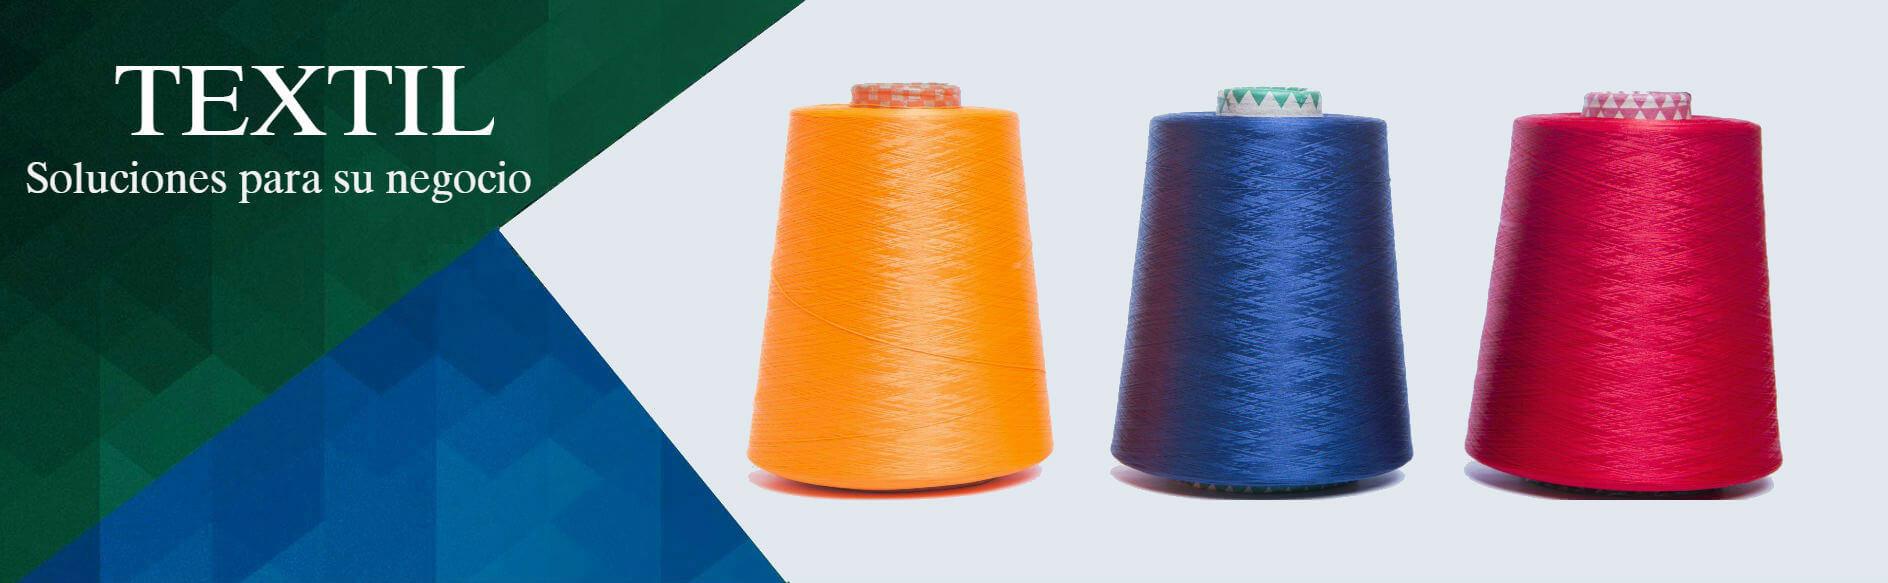 Enkador textil